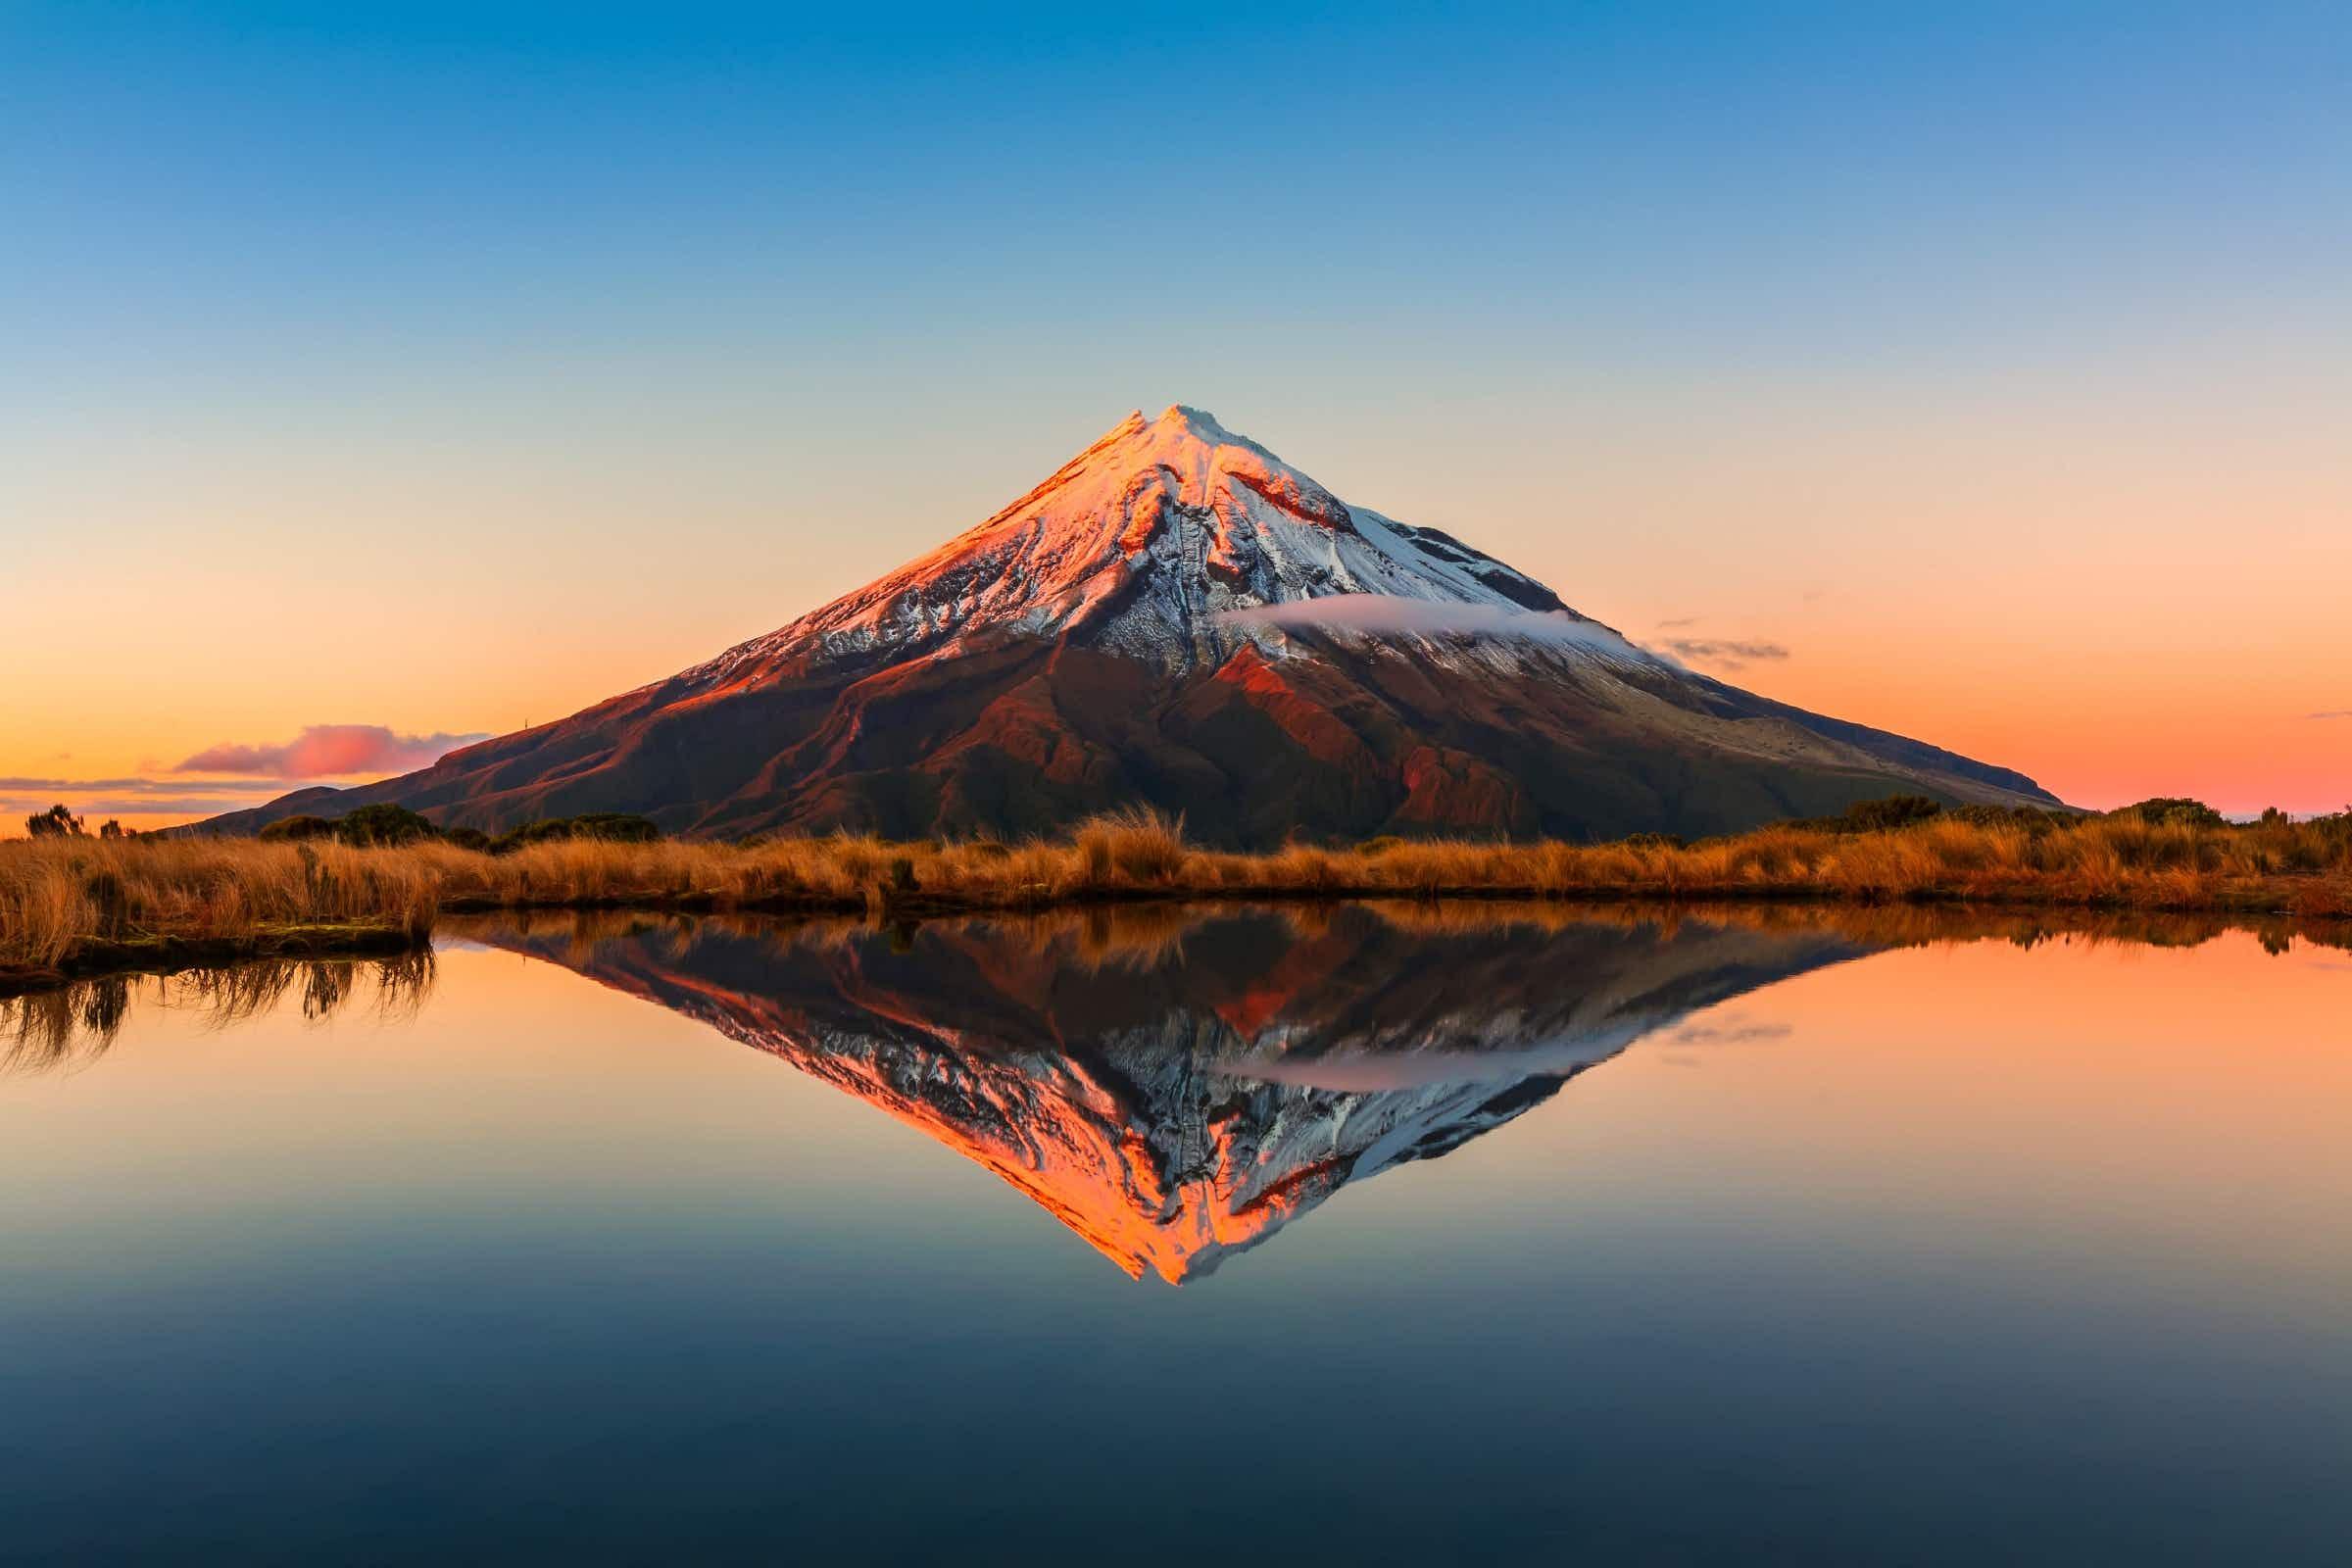 New Zealand's Mount Taranaki granted 'living person' status